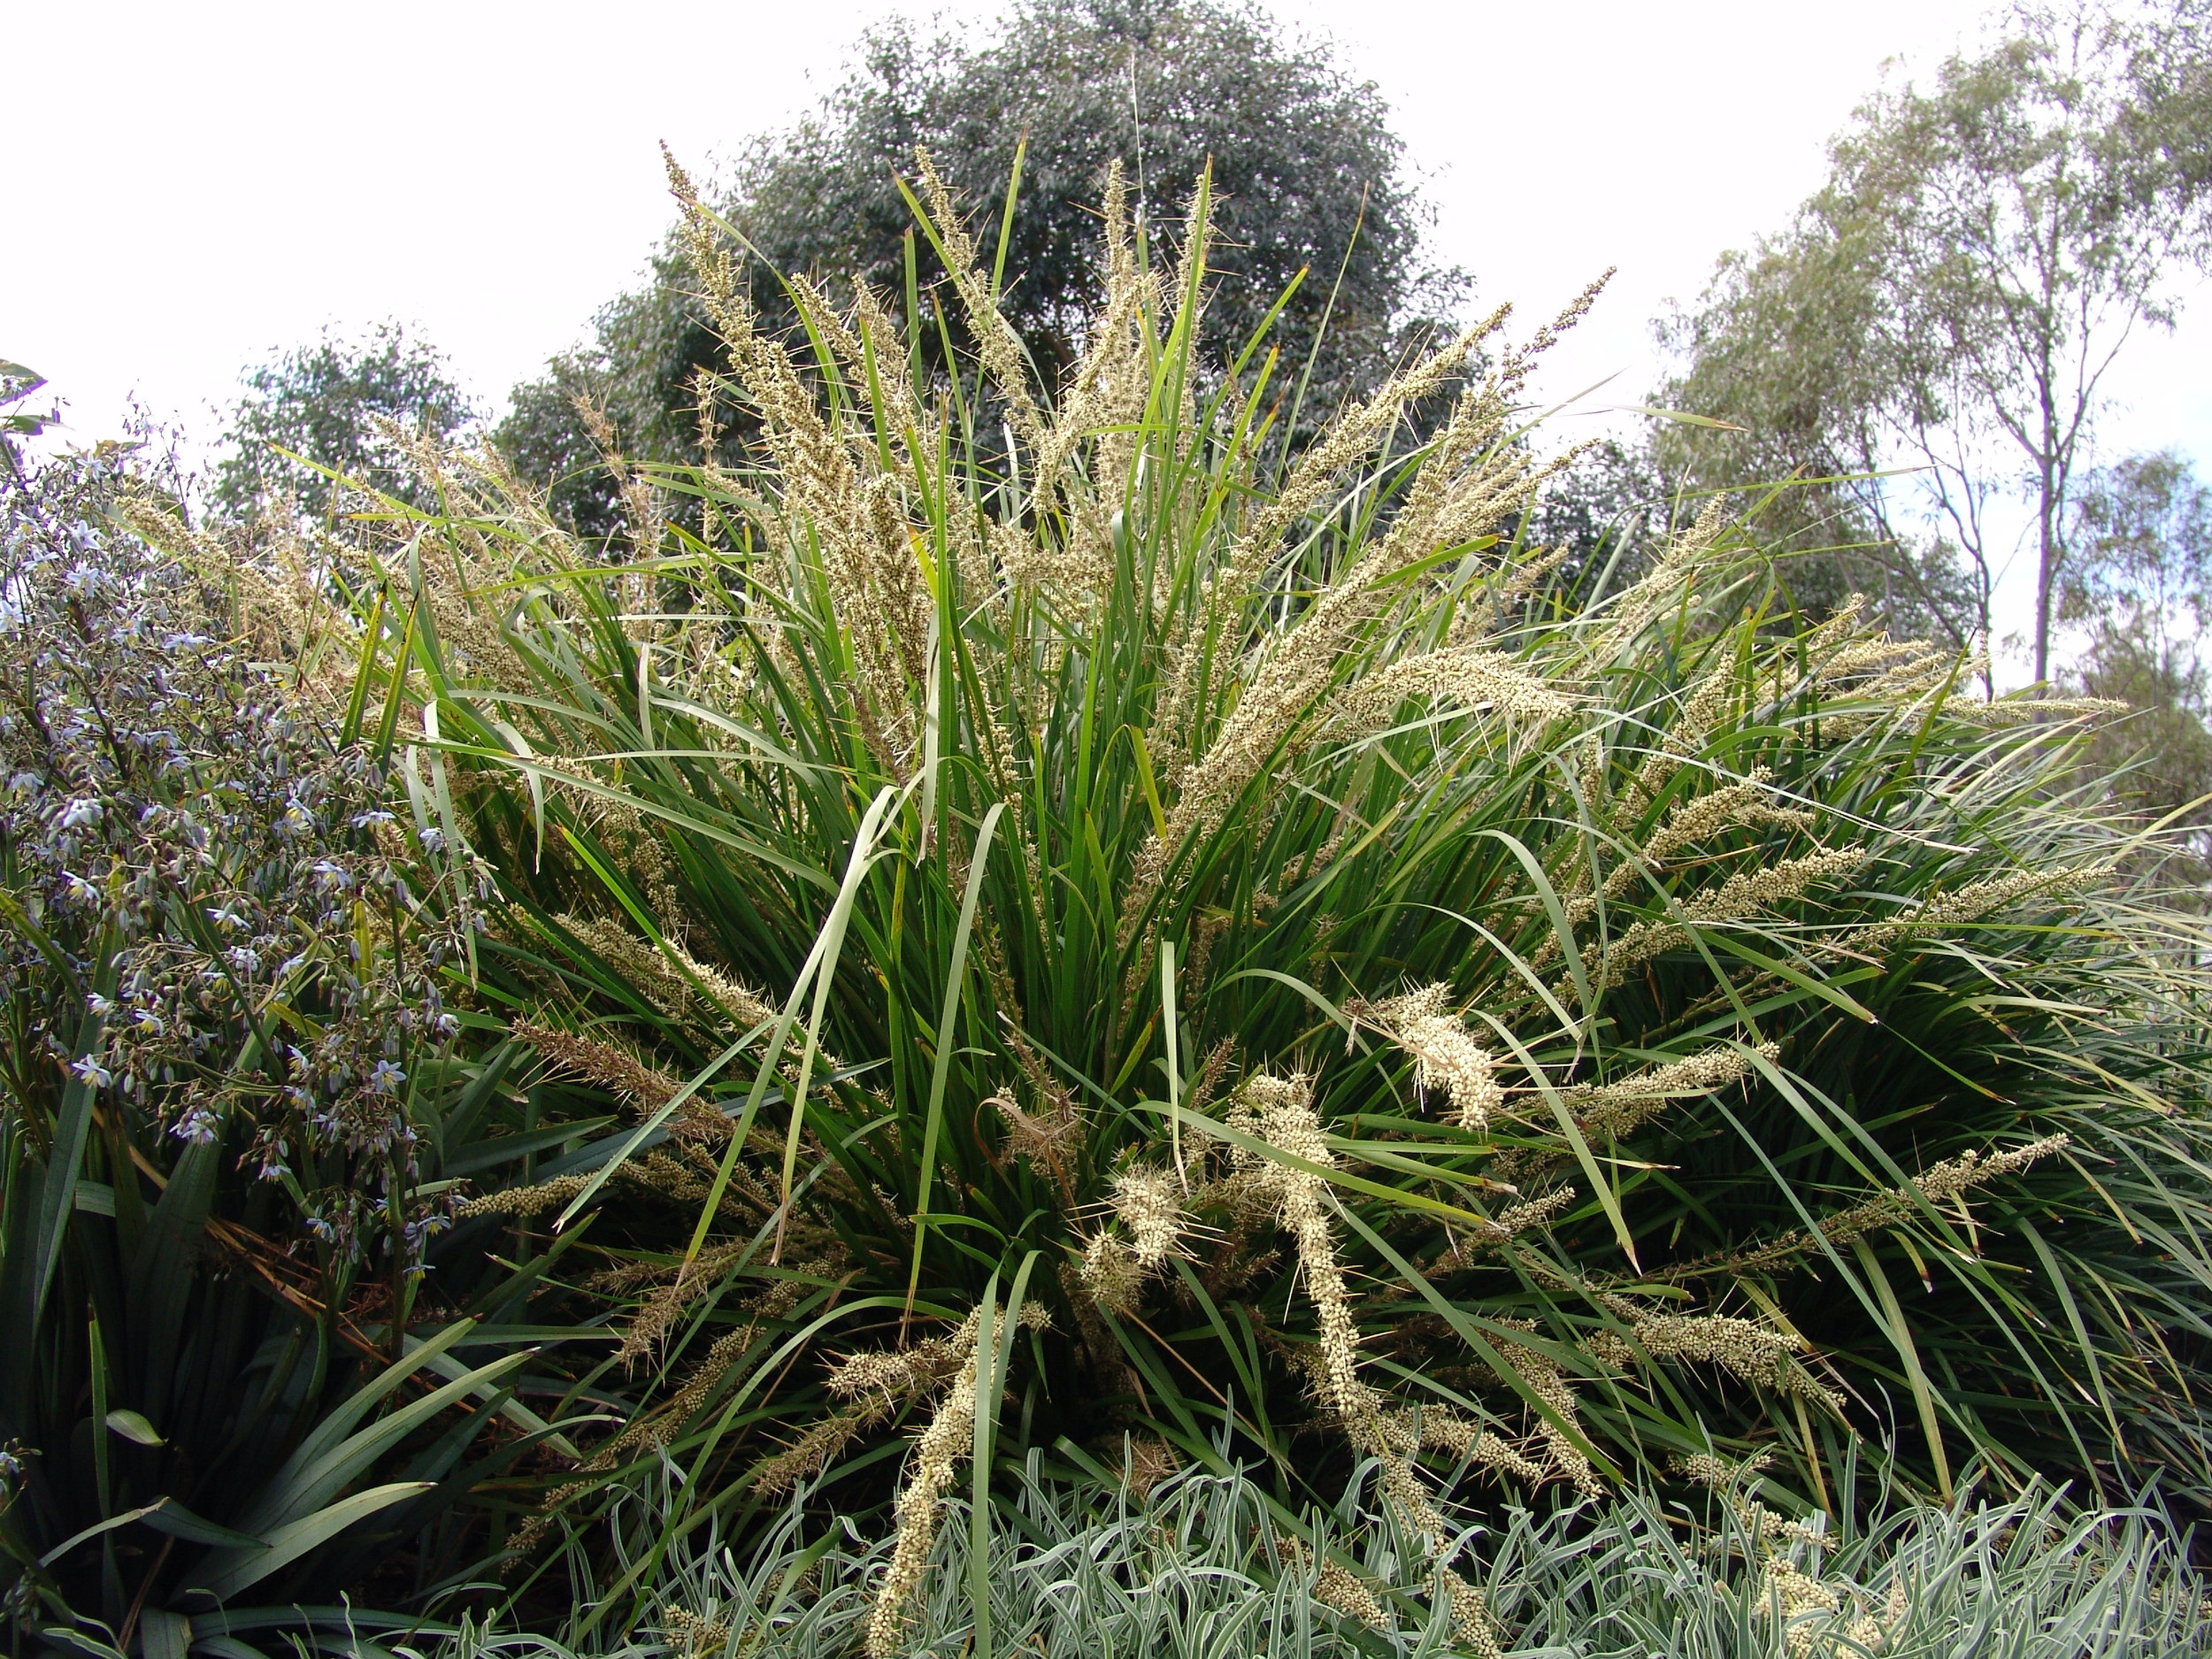 Katrinus Deluxe Lomandra longfolia 'Katrinus Deluxe' PBR